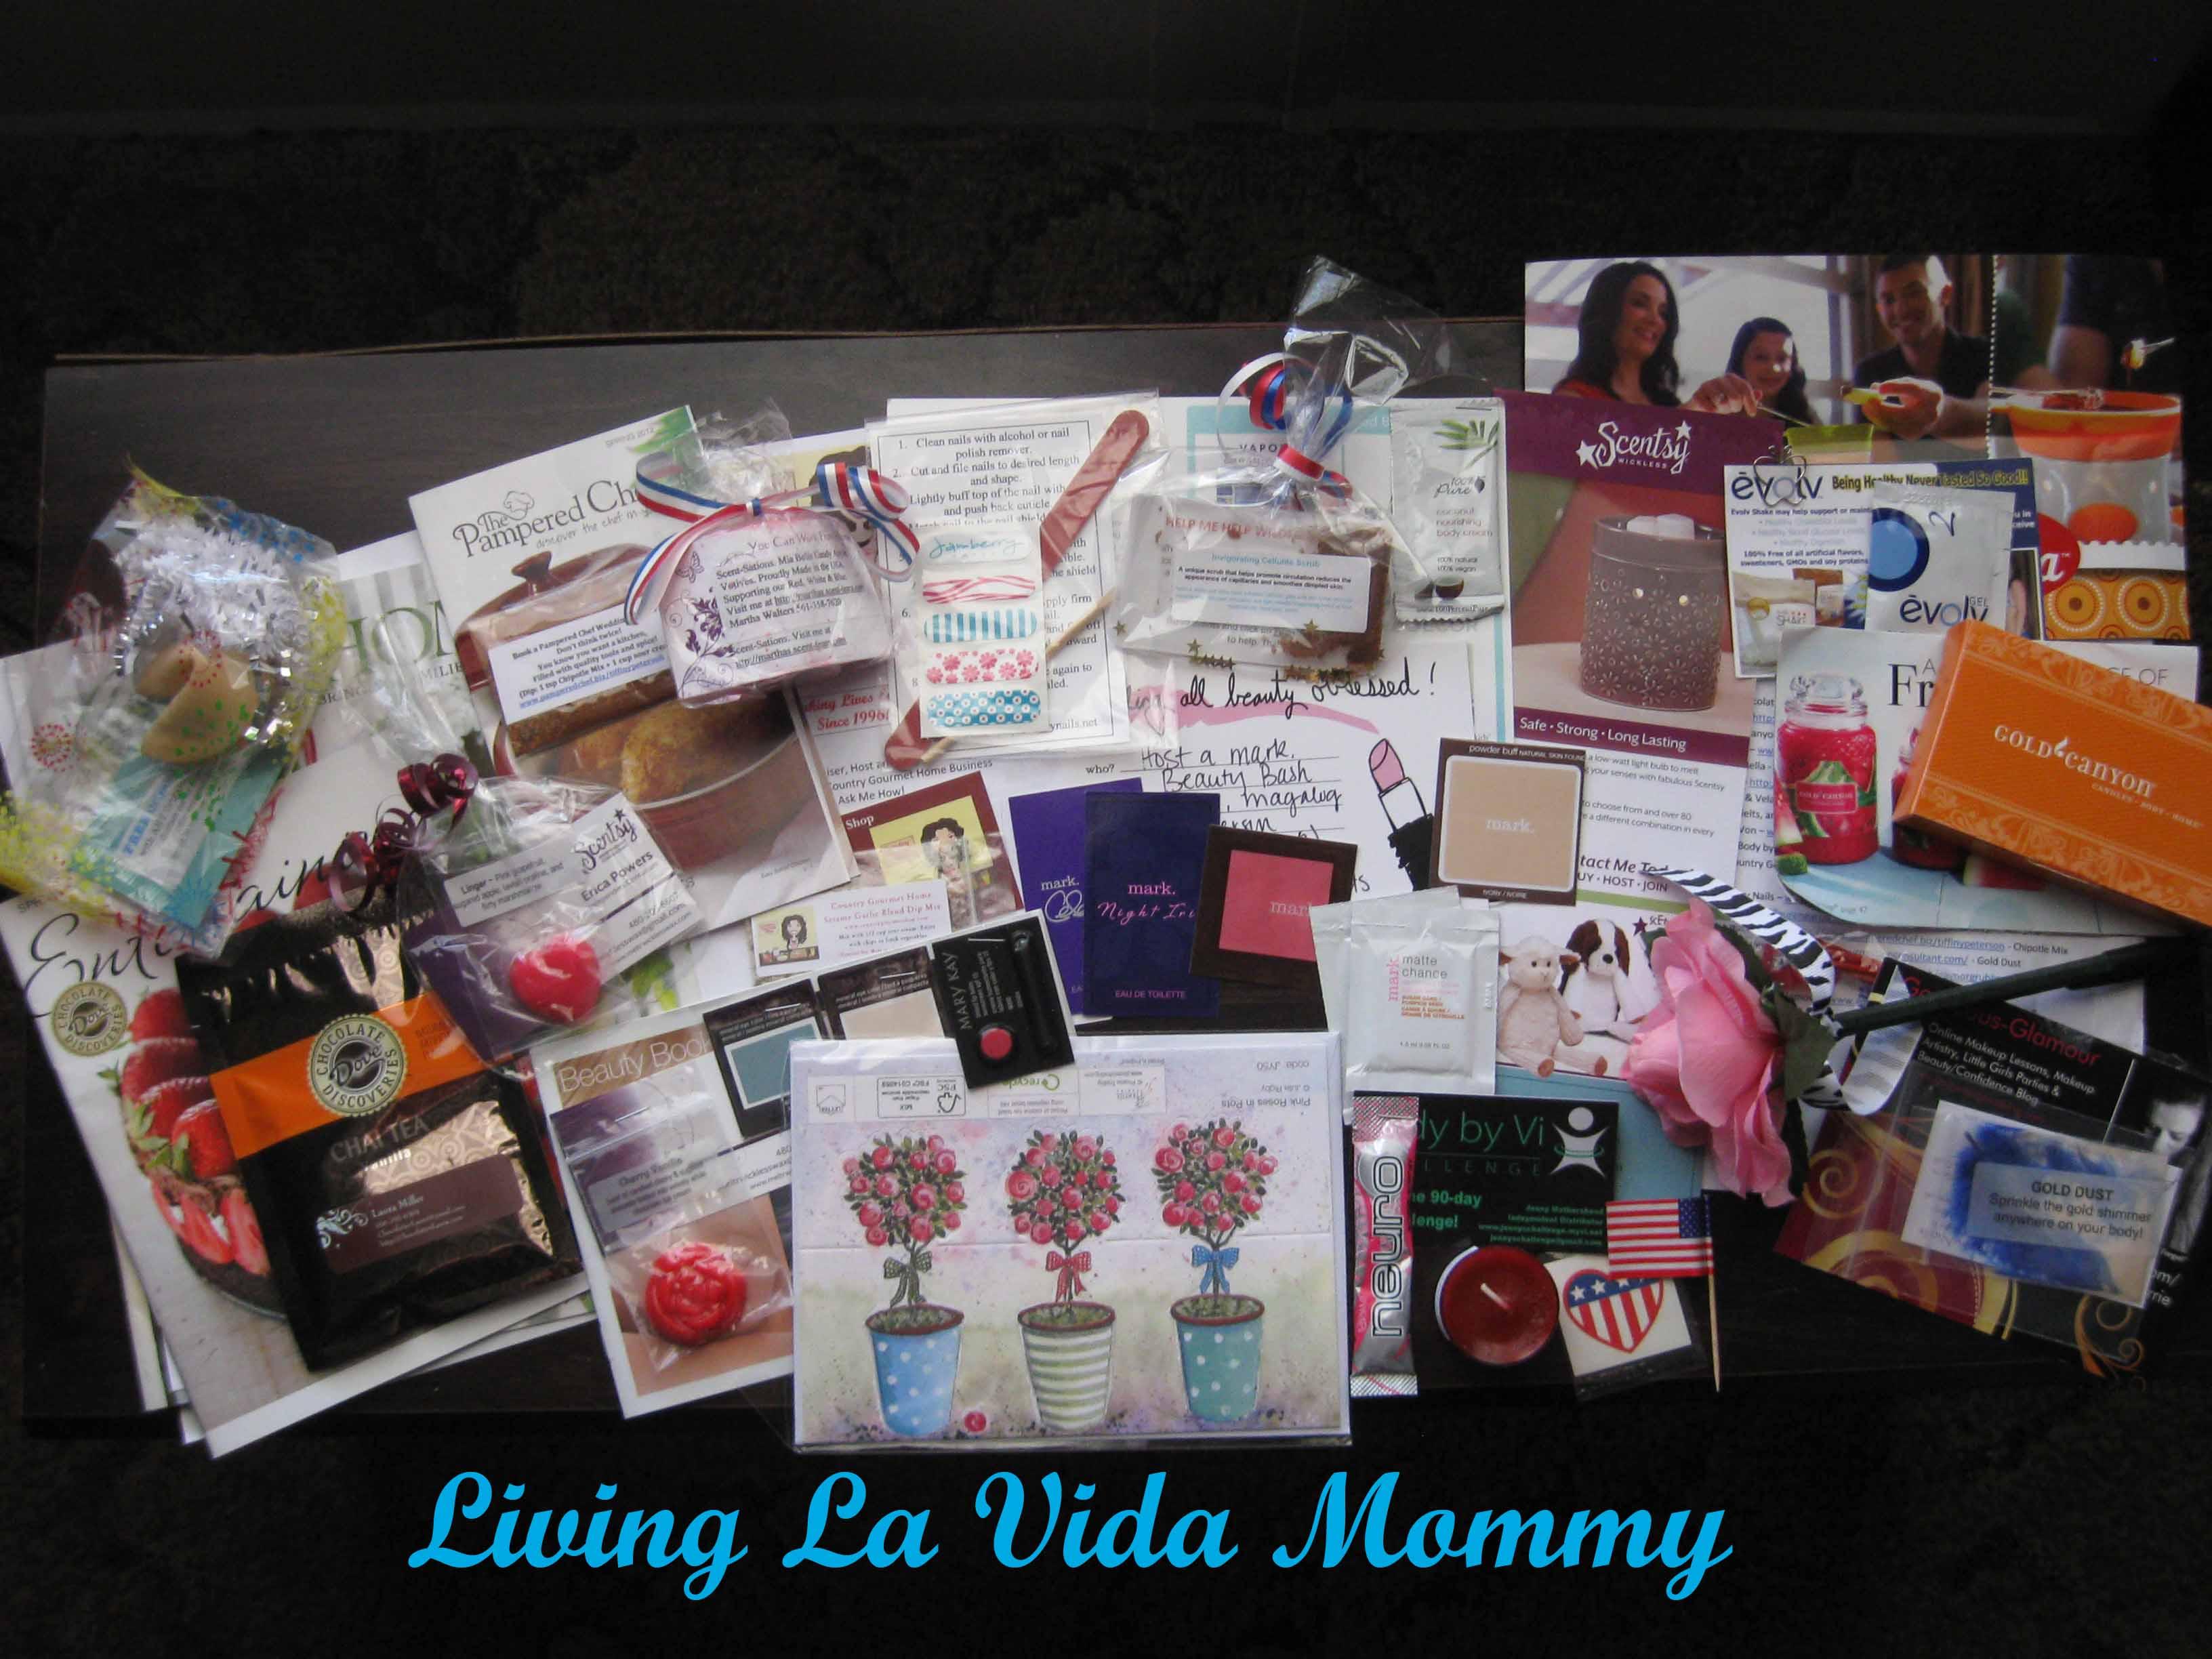 My Dream Sample Box Review | Living La Vida Mommy